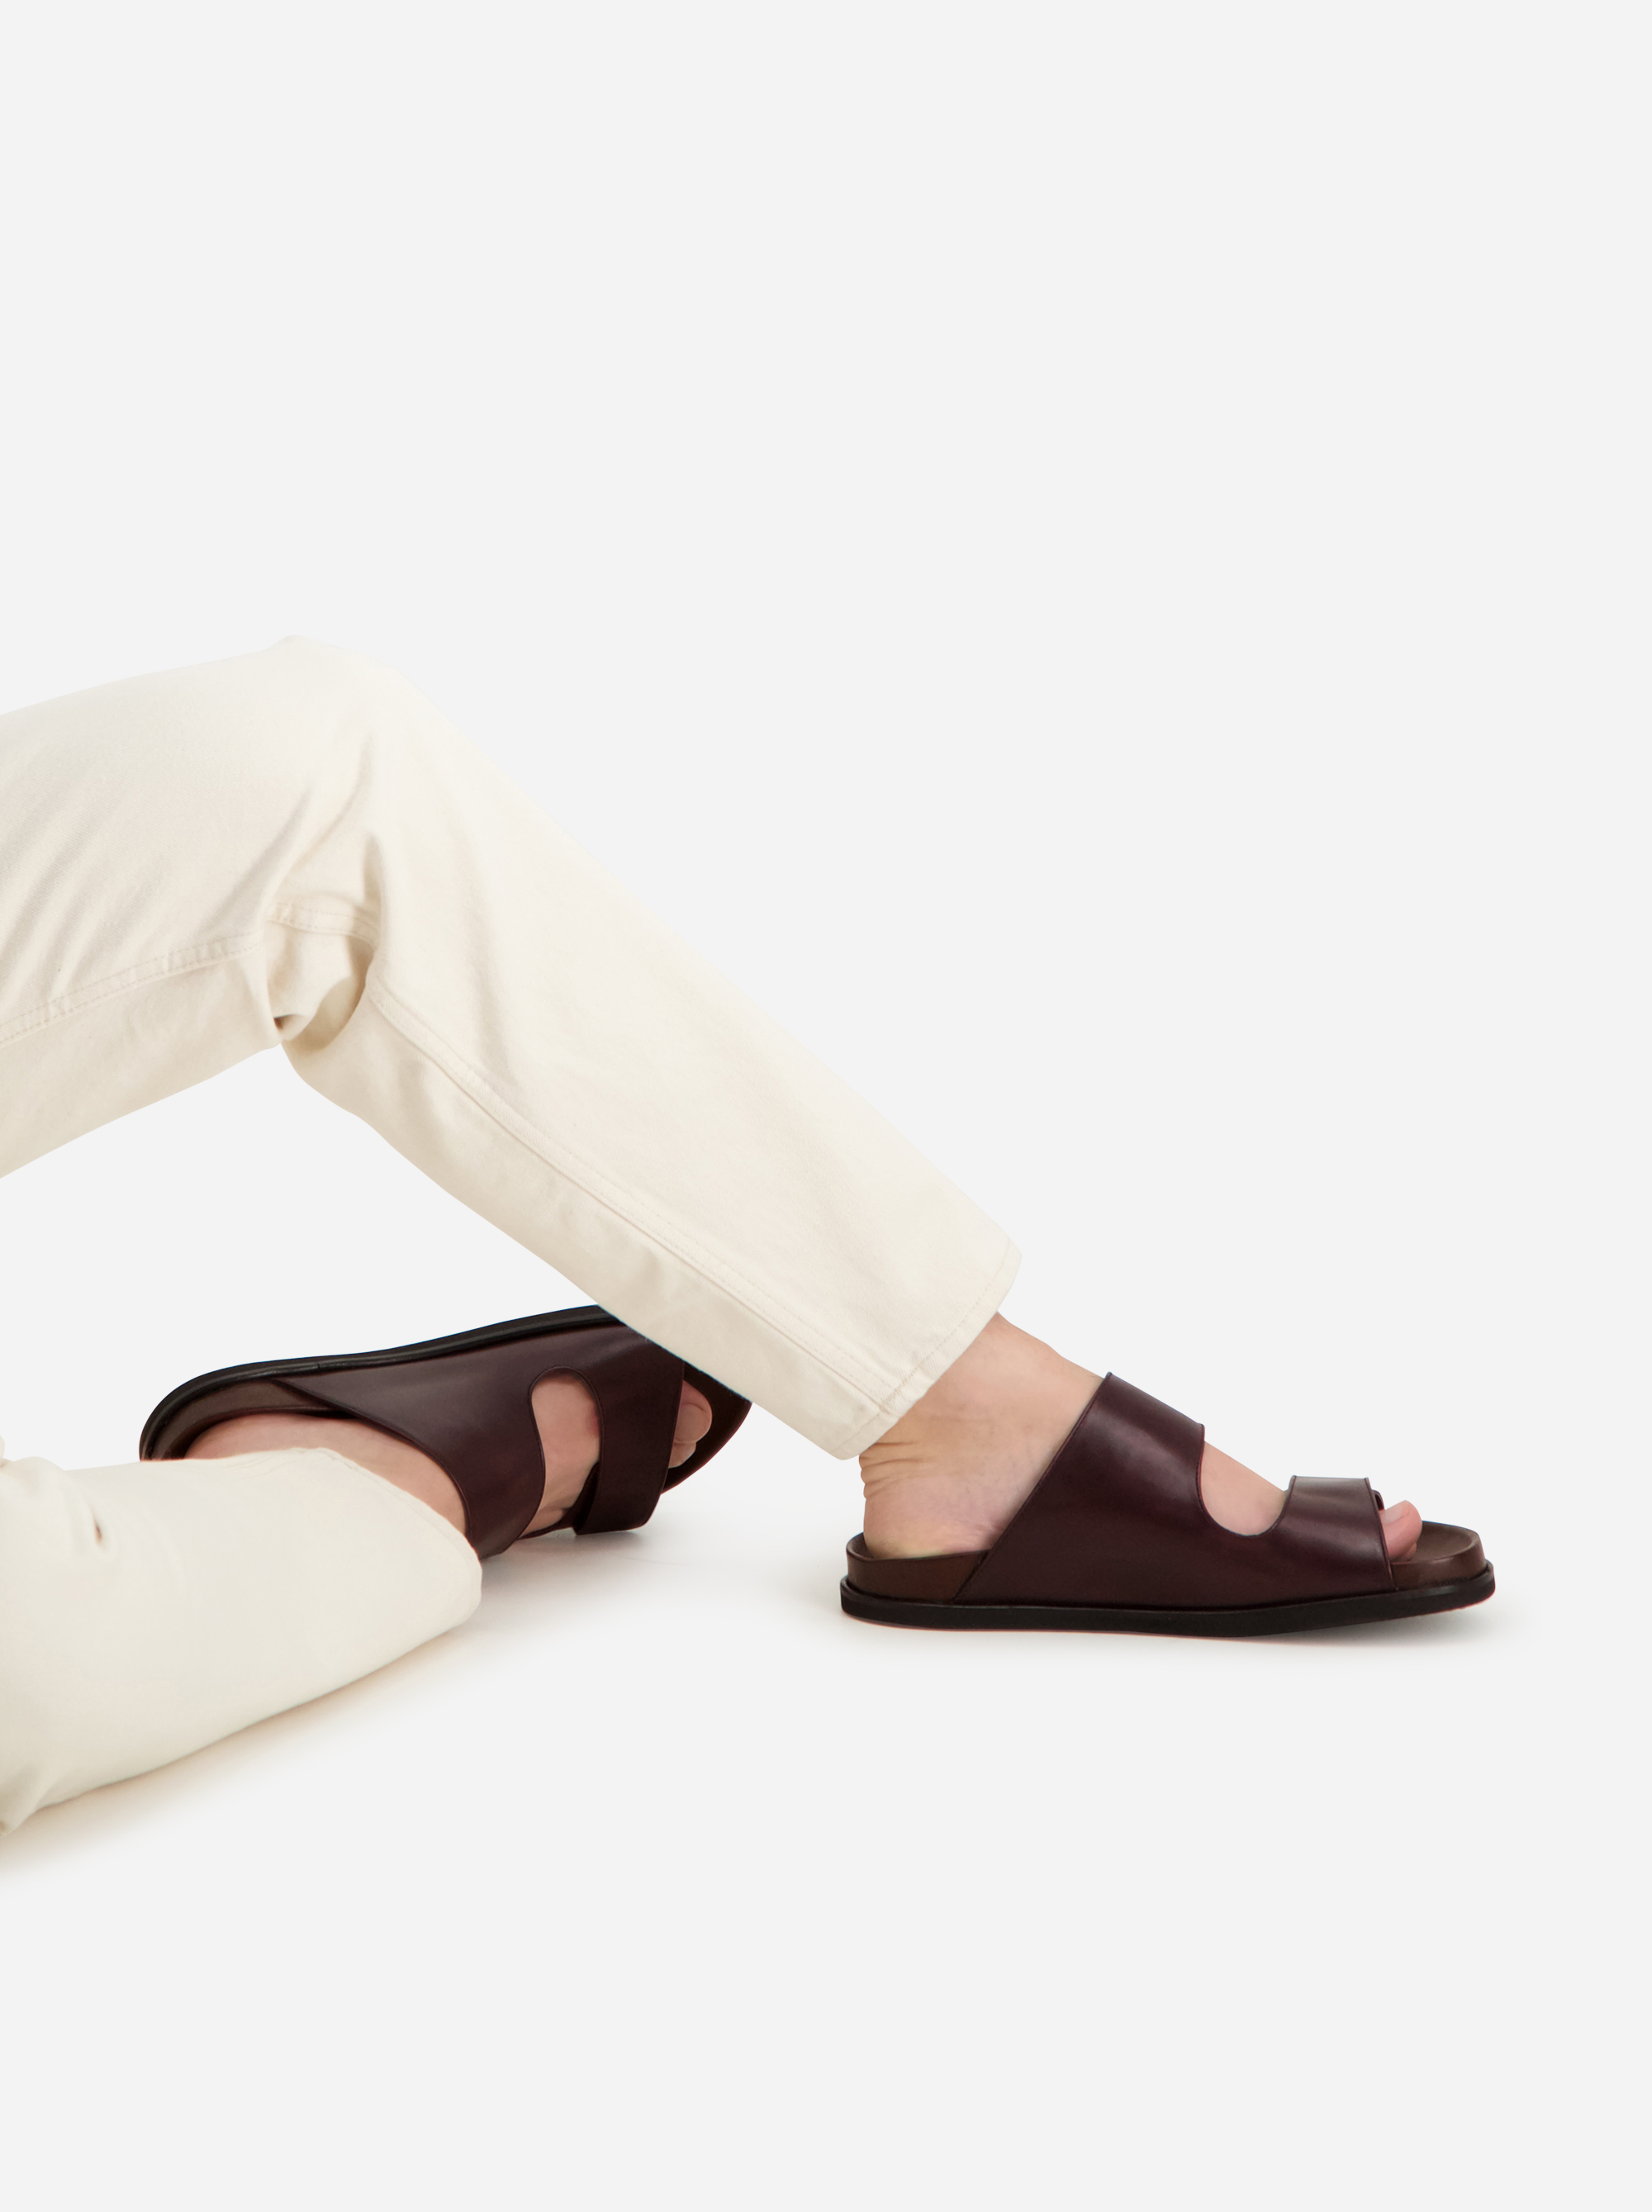 Teym - The Sandal - Burgundy - Men - 3